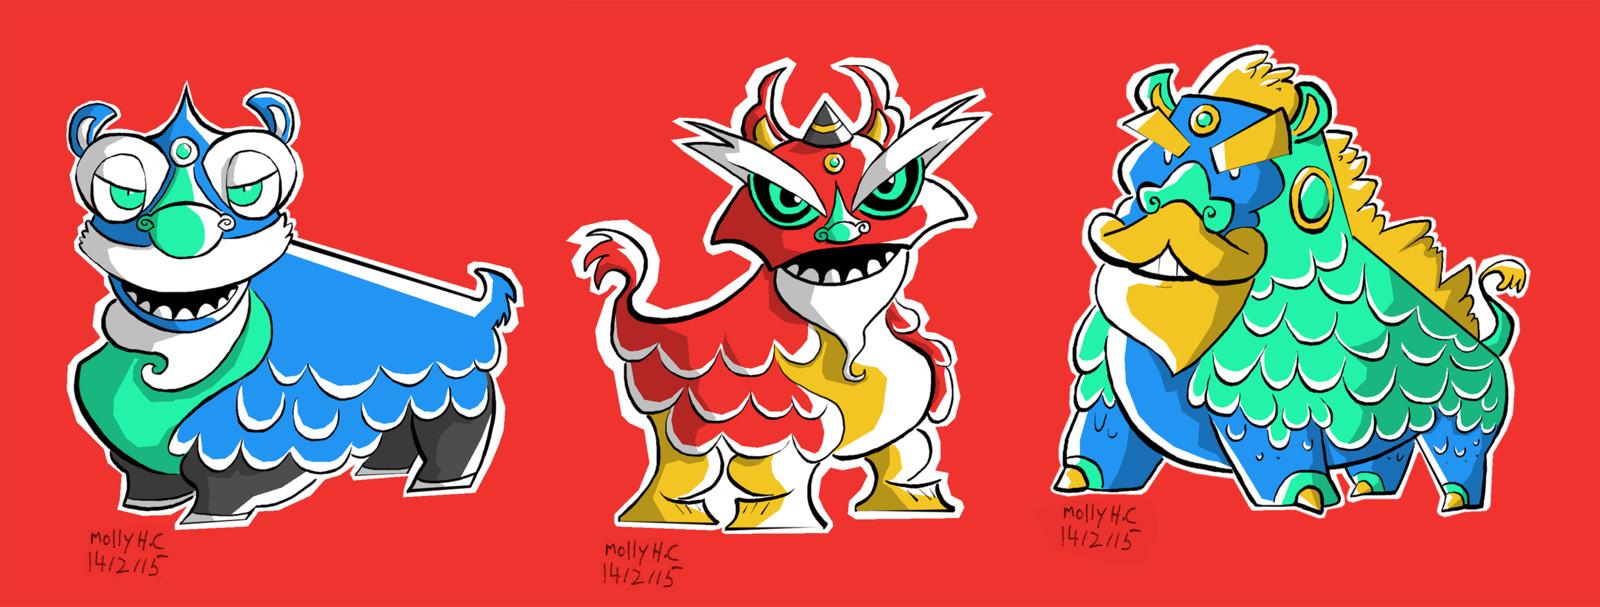 Nihan Character Concepts